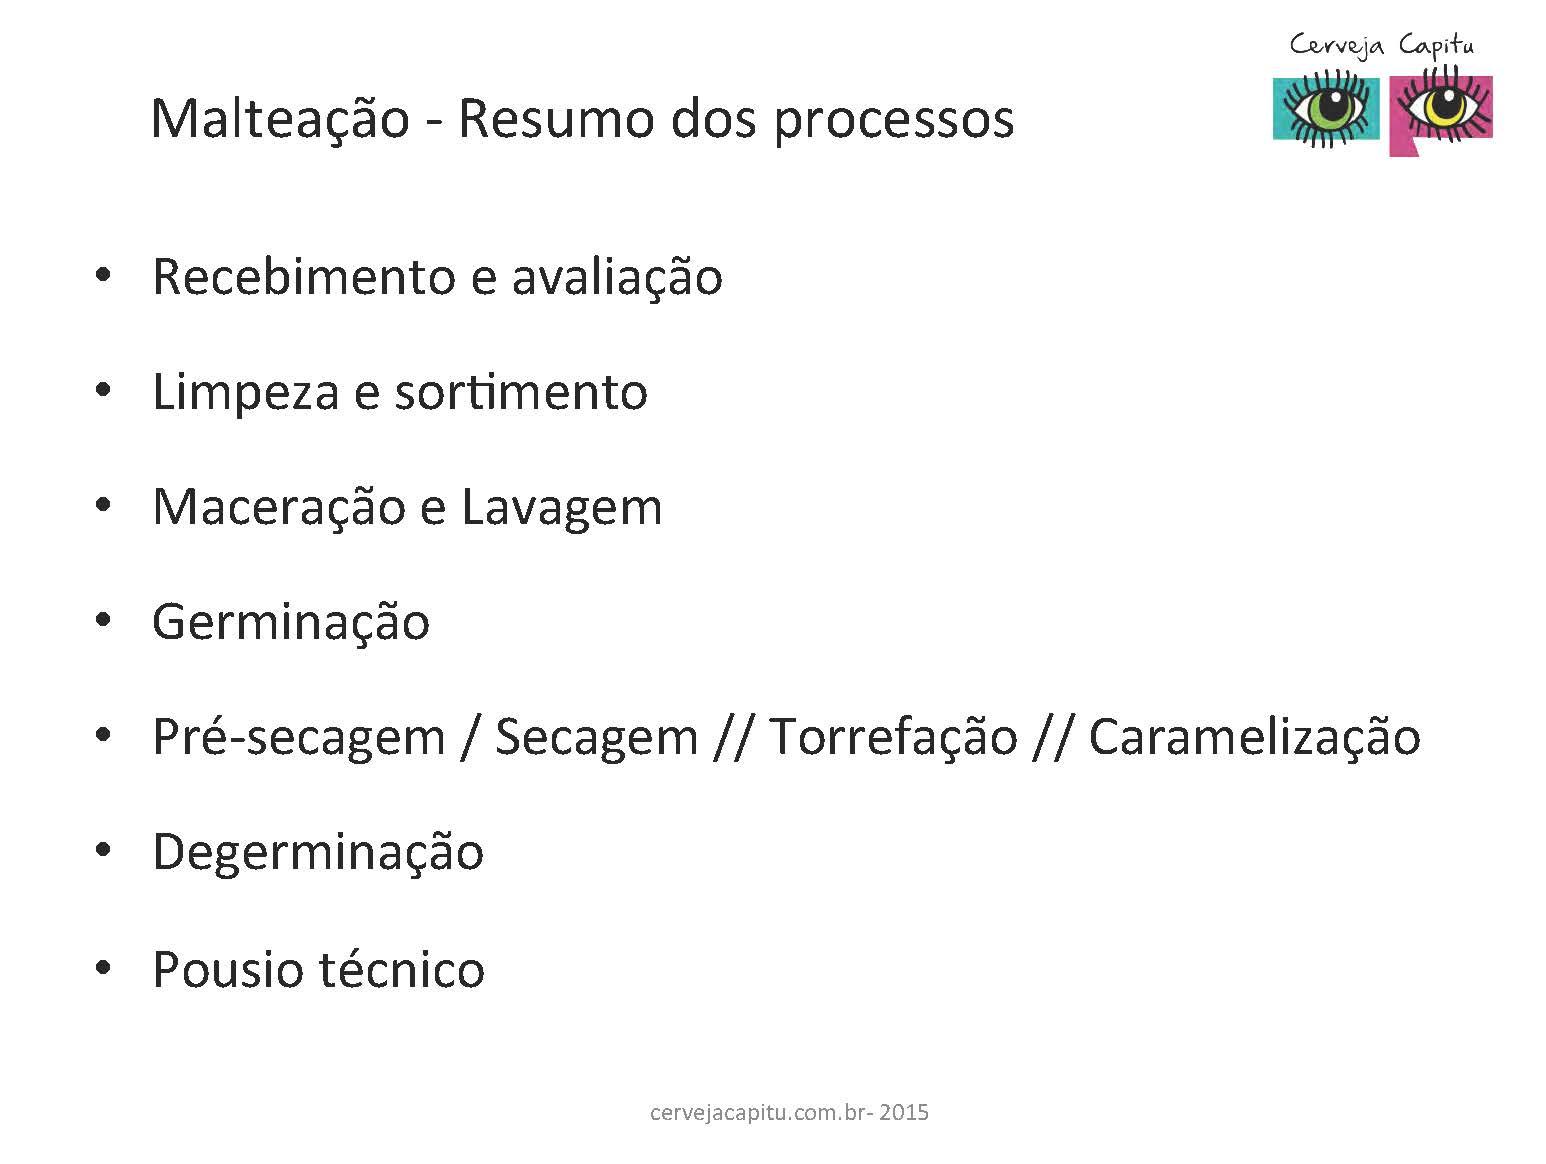 Princípios da Malteação_Capitu_SM_Page_03.jpg